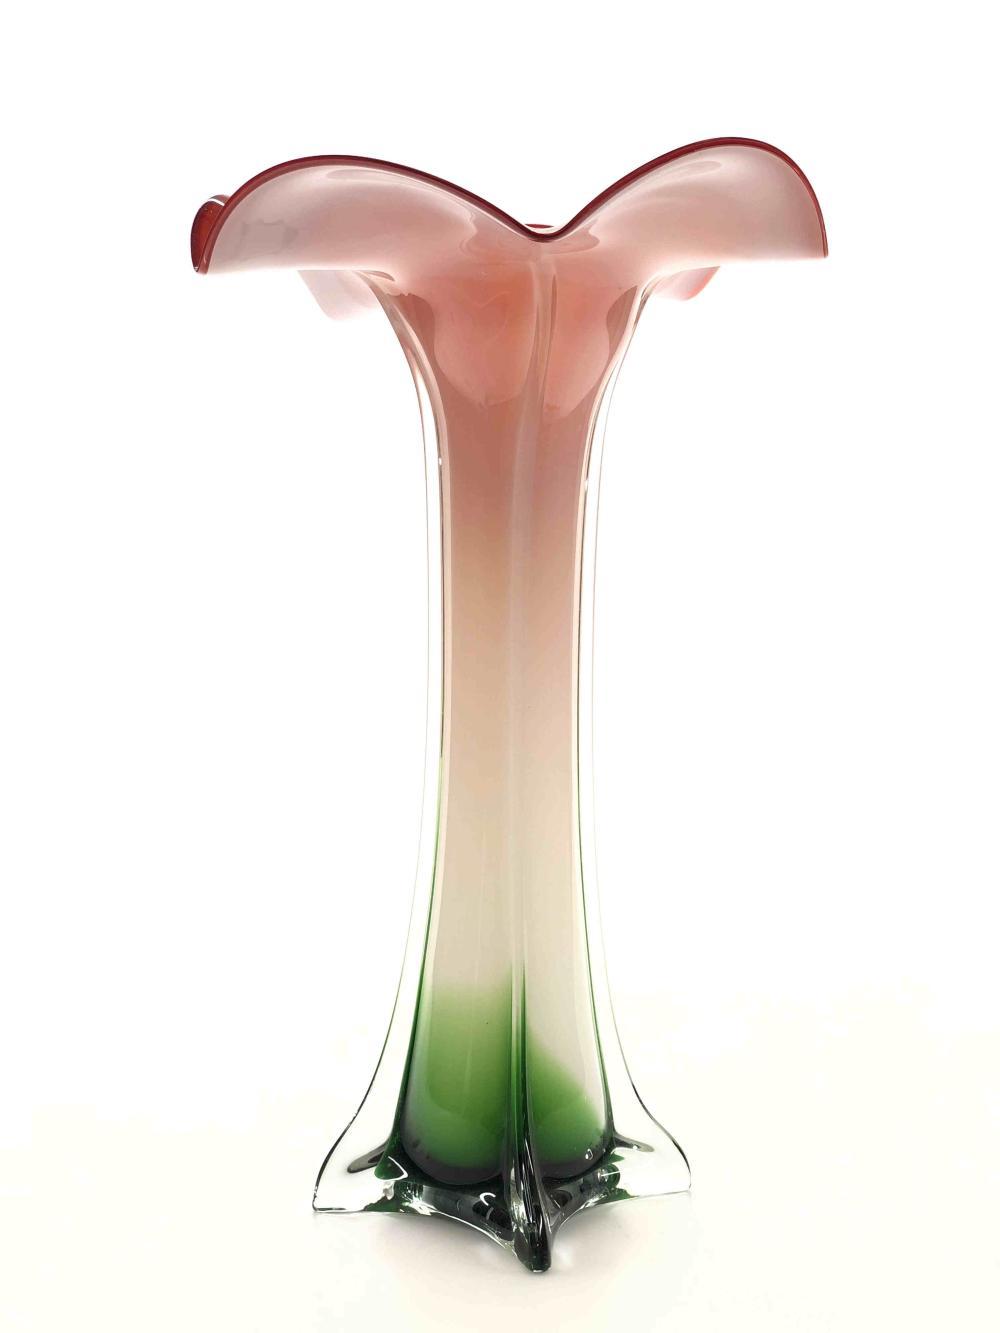 VINTAGE MURANO CASED ART GLASS TULIP VASE